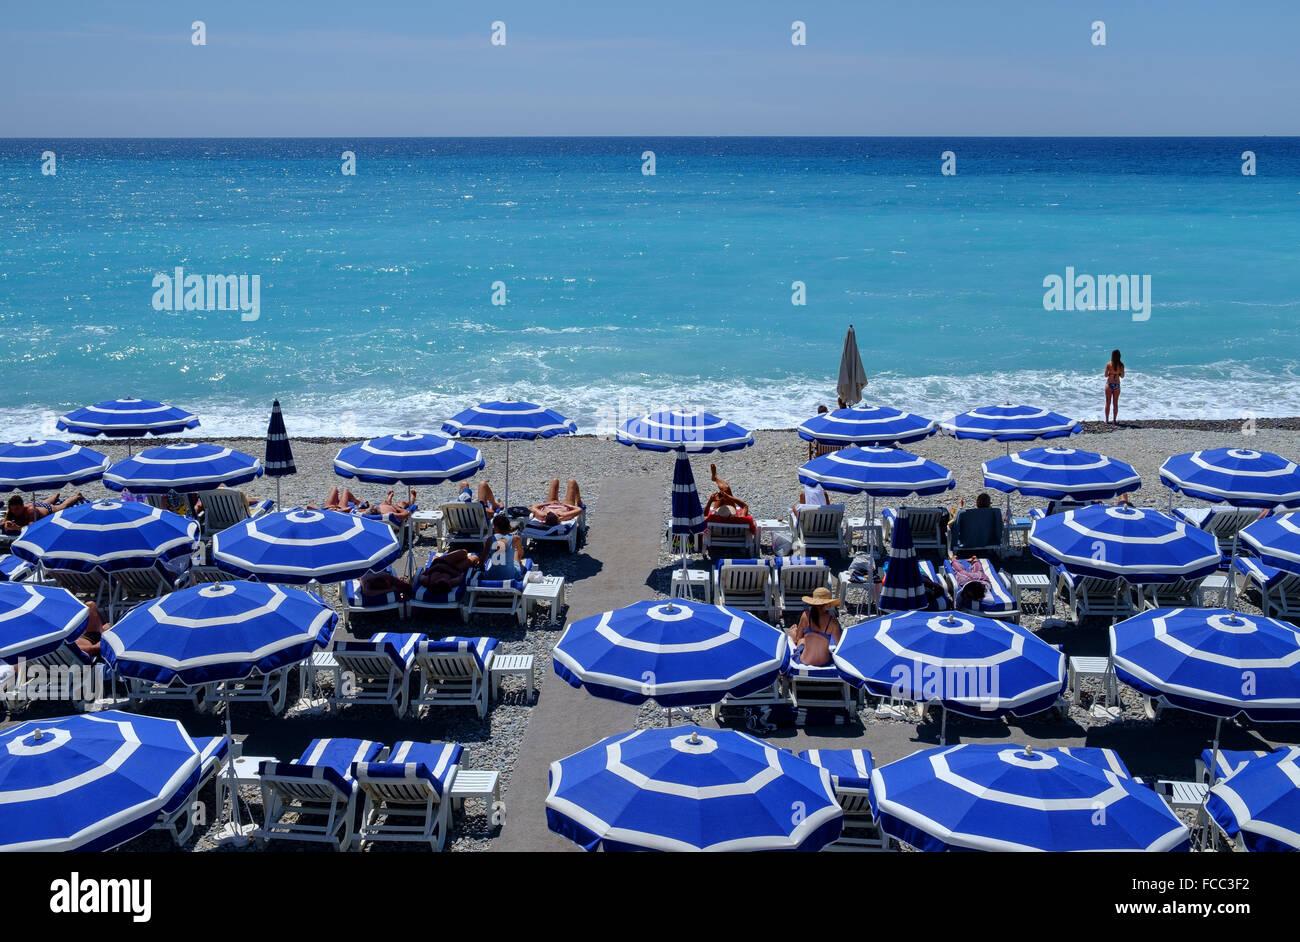 sunbathers beach umbrellas loungers holiday france - Stock Image